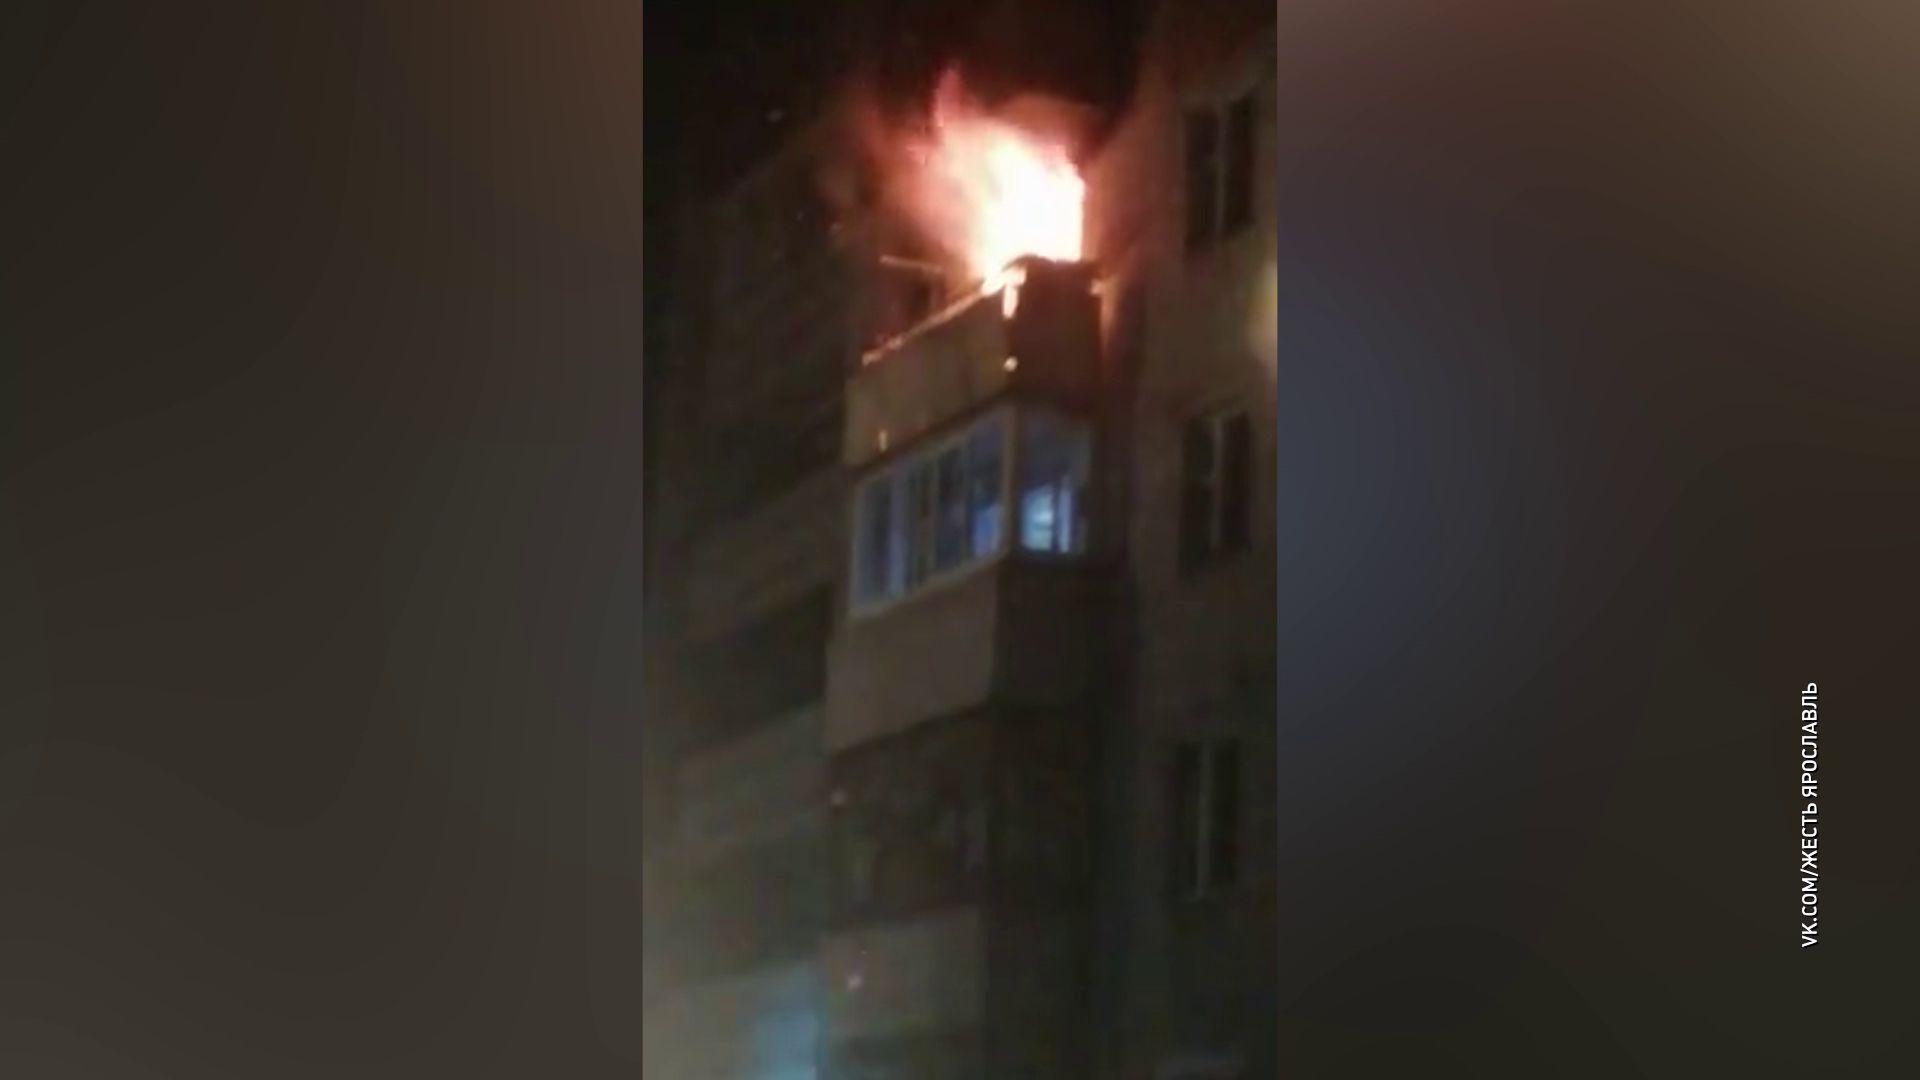 На Фрунзе в многоэтажке сгорела квартира